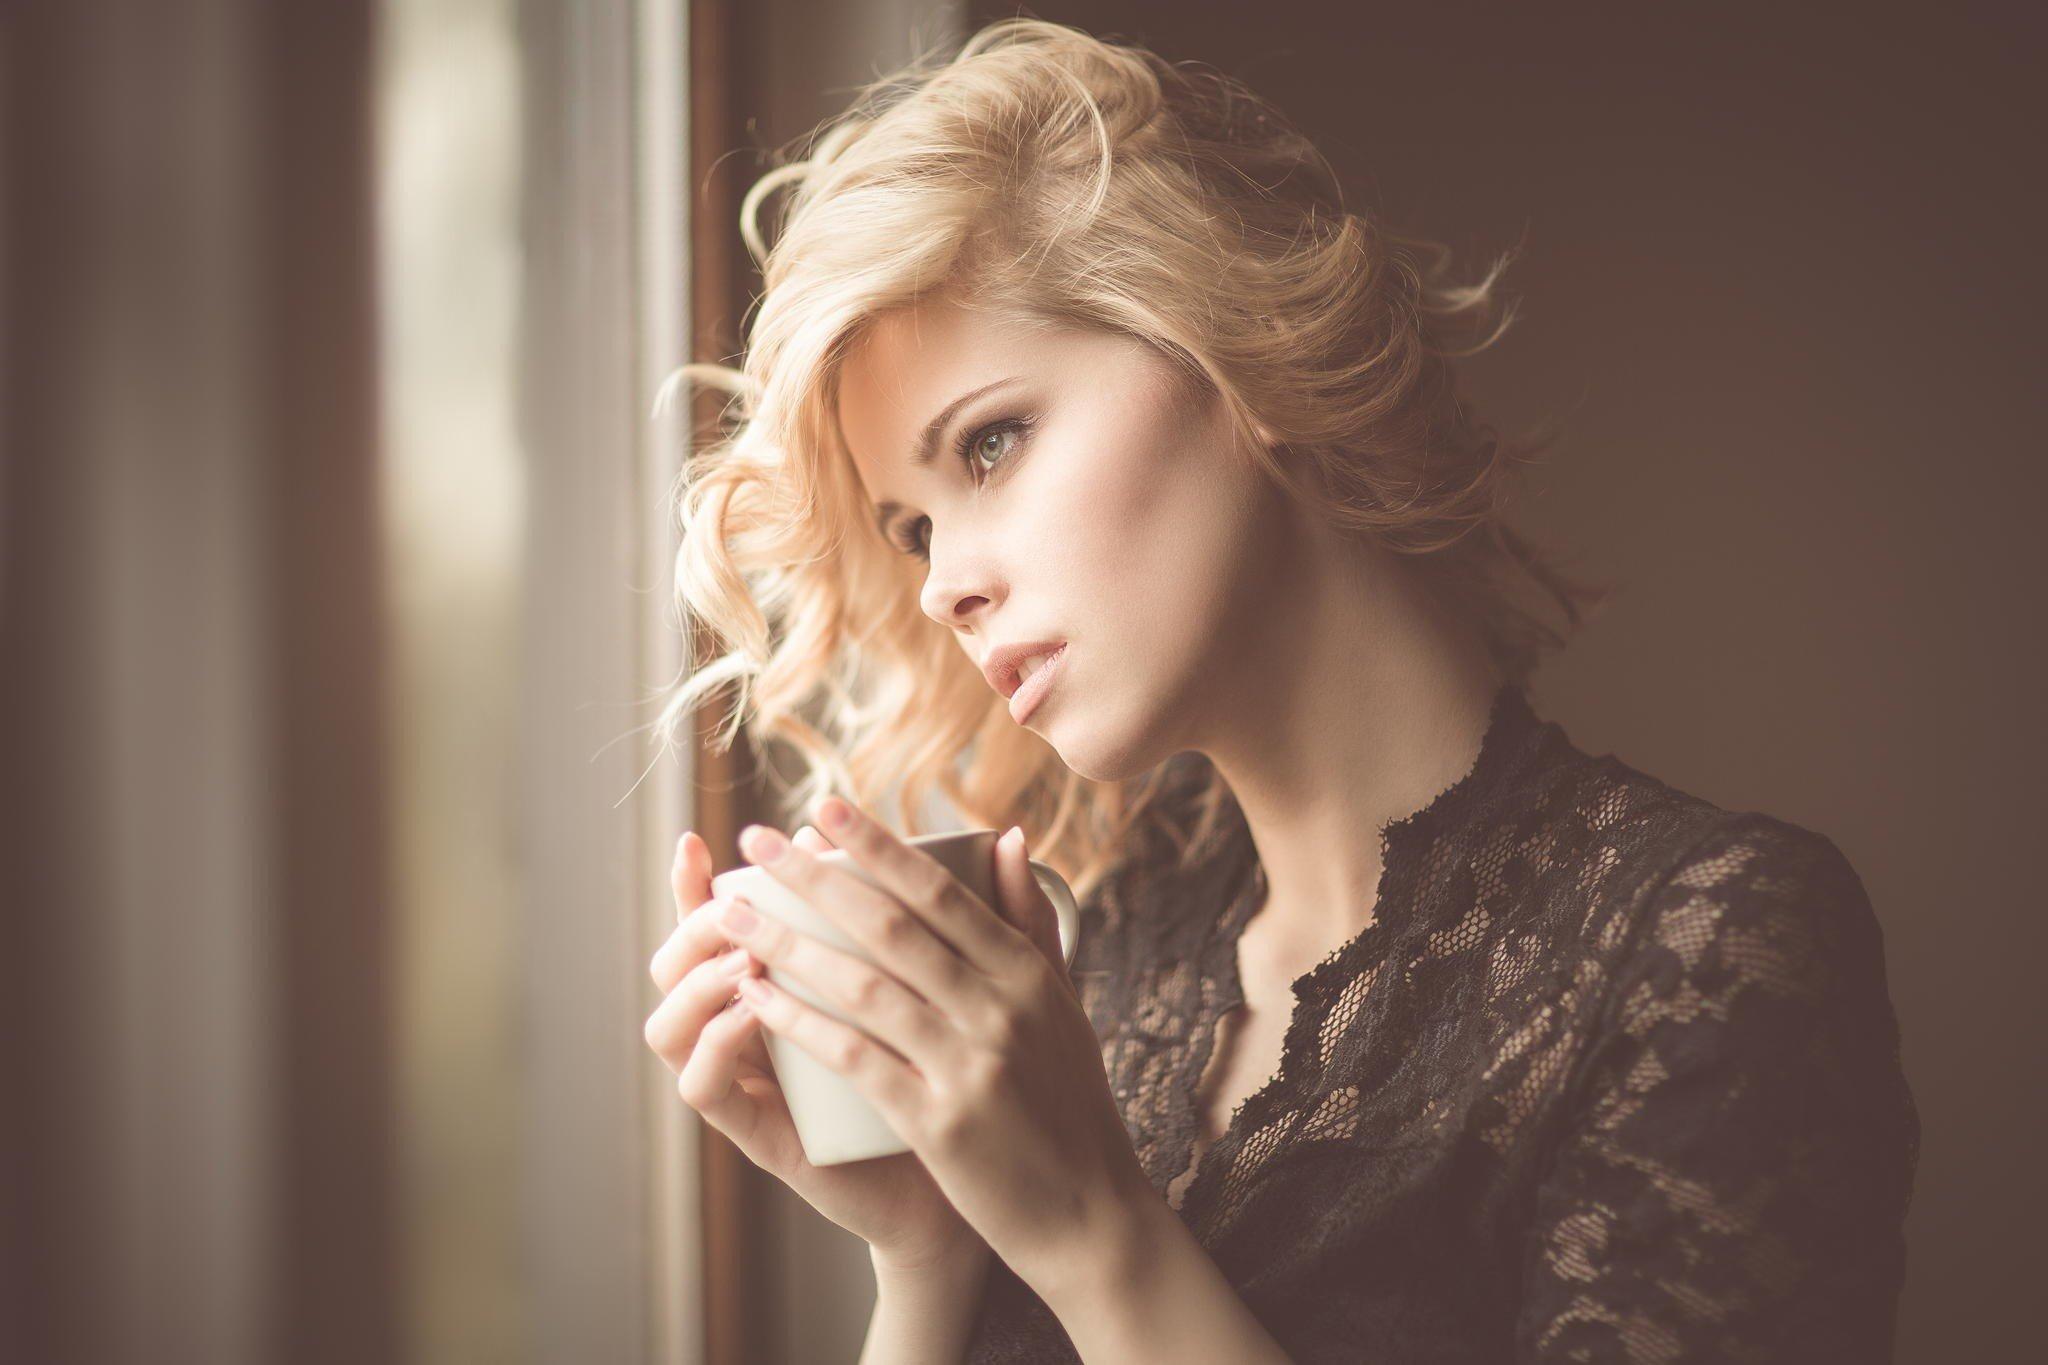 women, Blonde, Curly hair Wallpaper